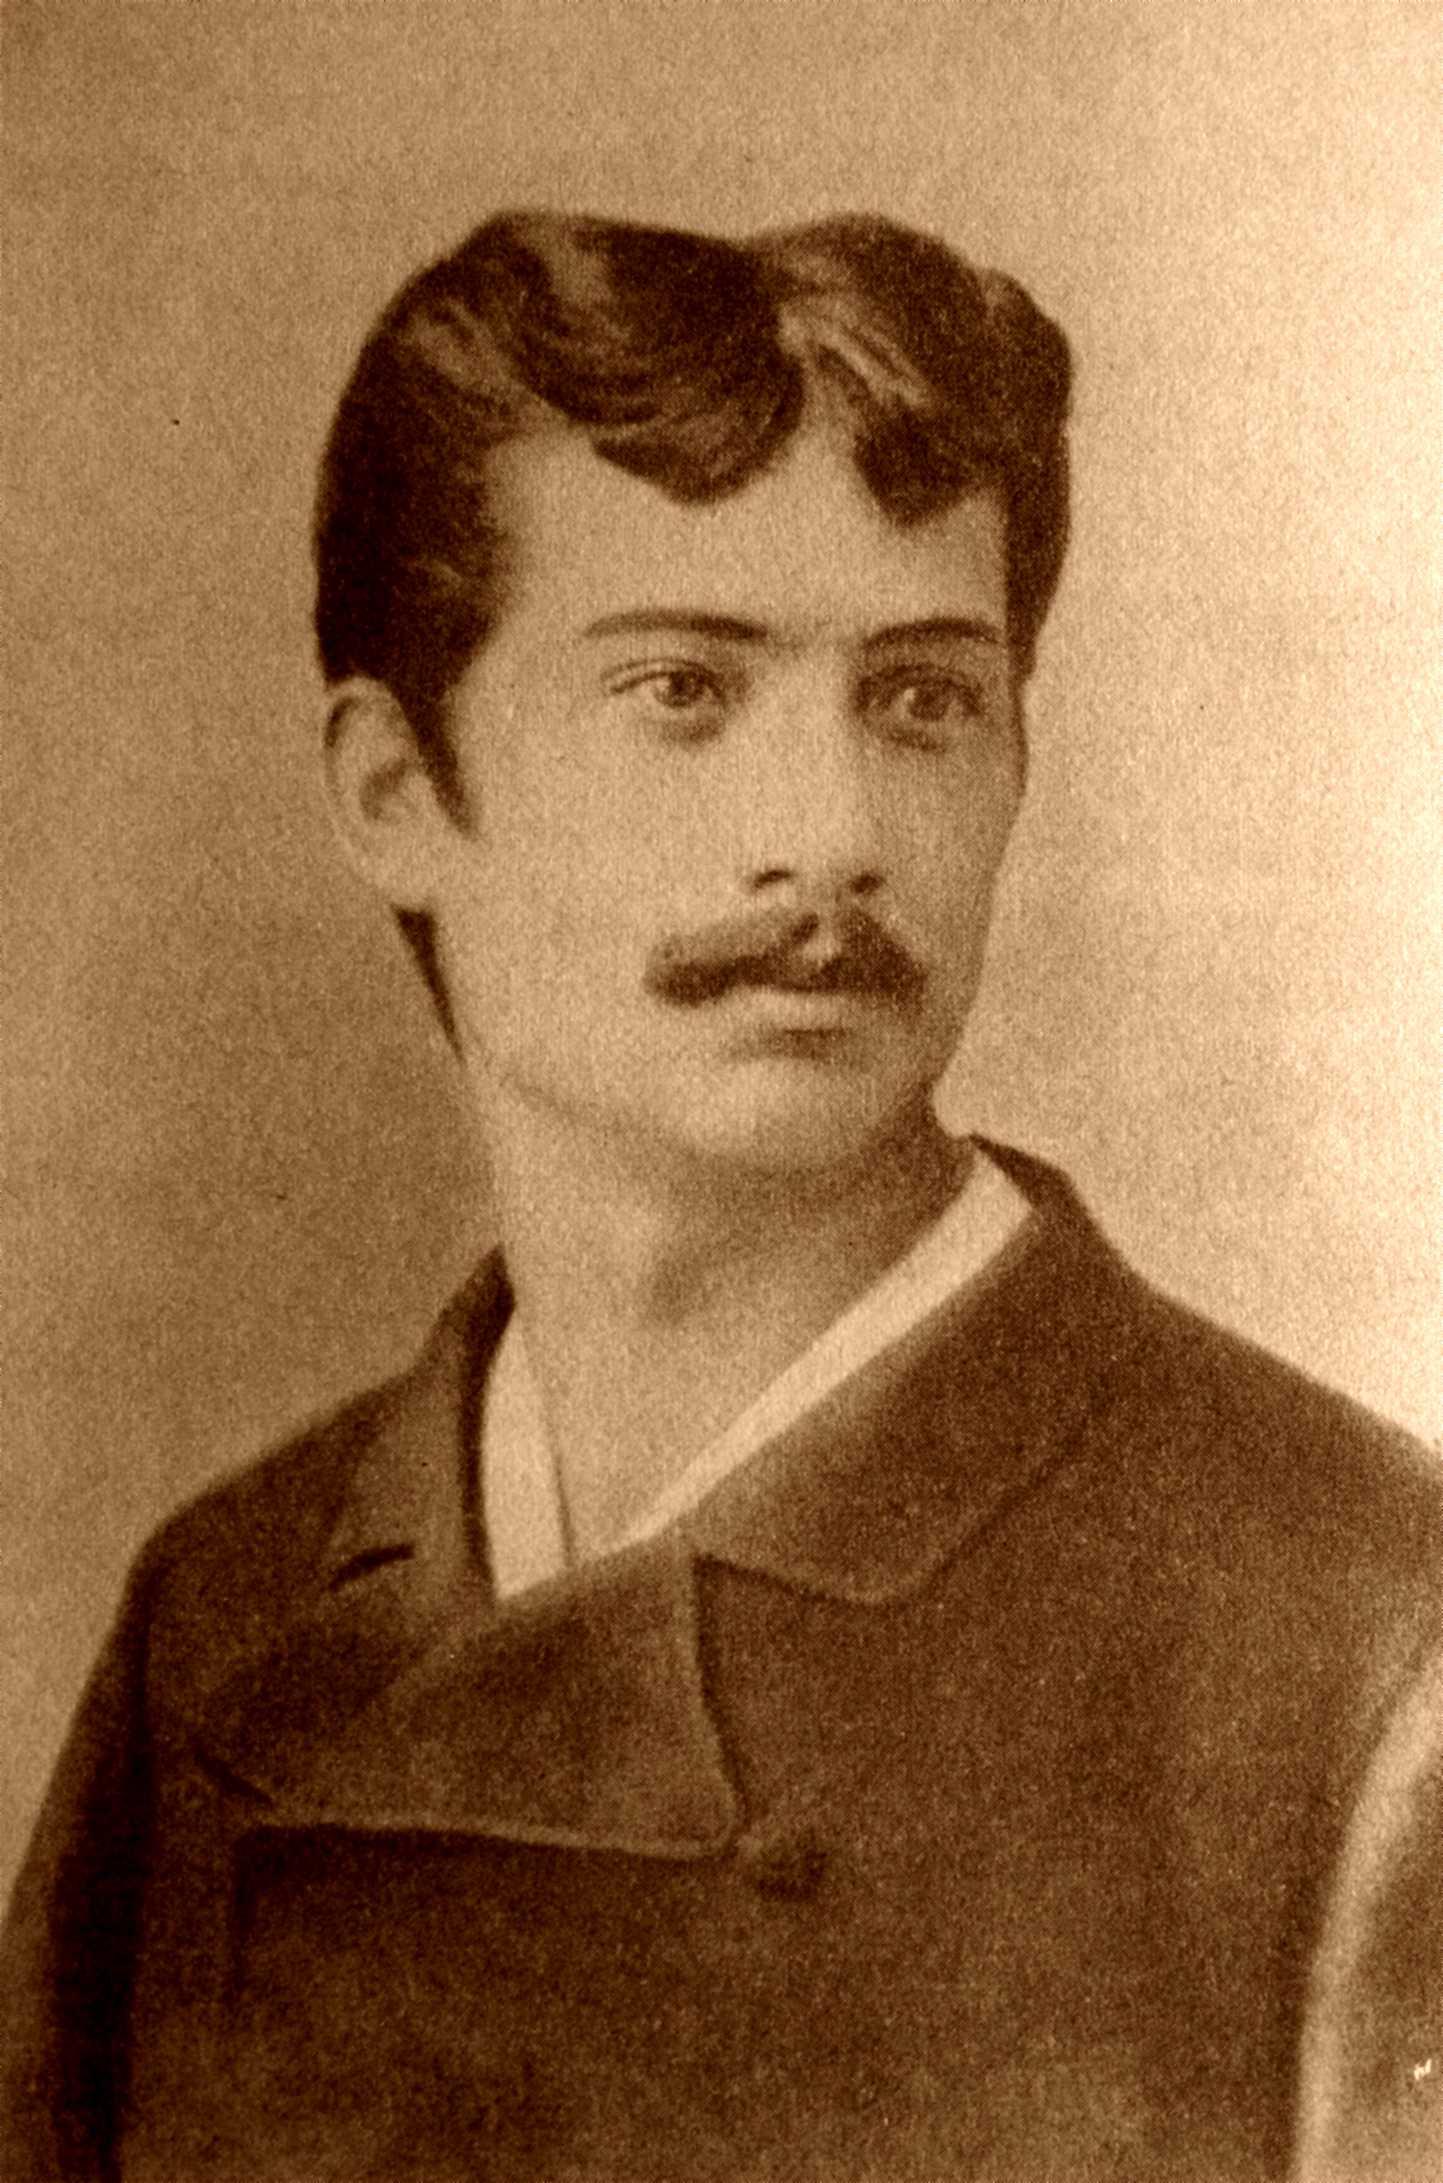 El jove Luigi Galleani